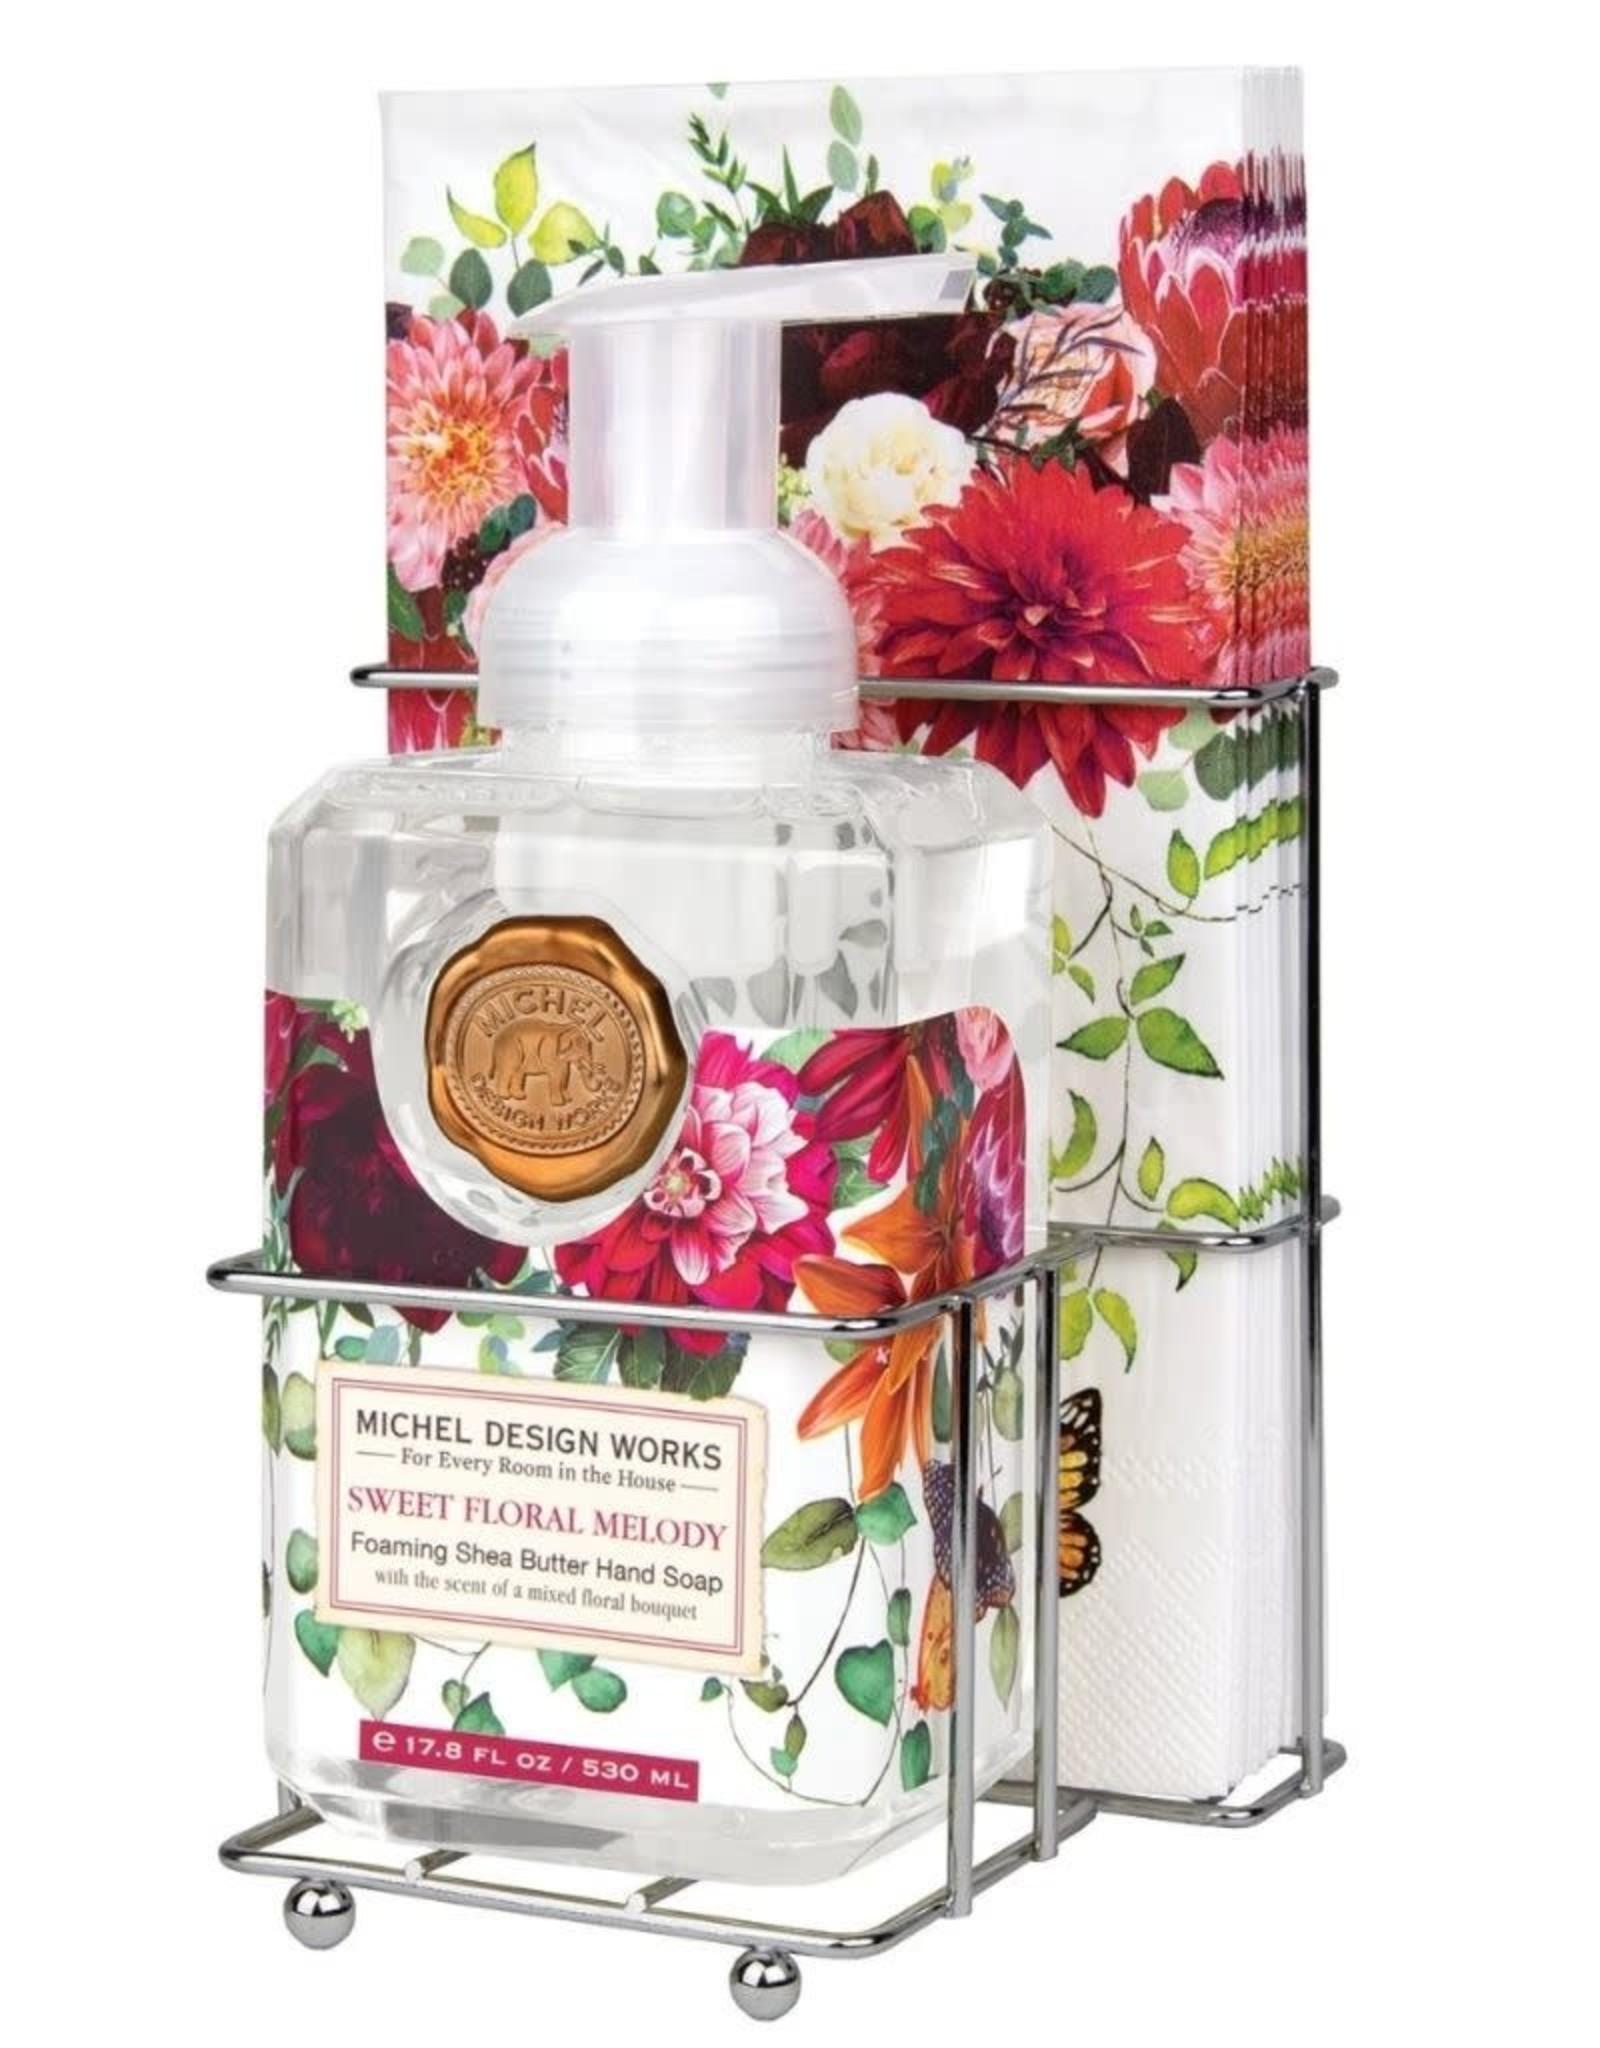 Sweet Floral Melody Foaming Soap Napkin Set